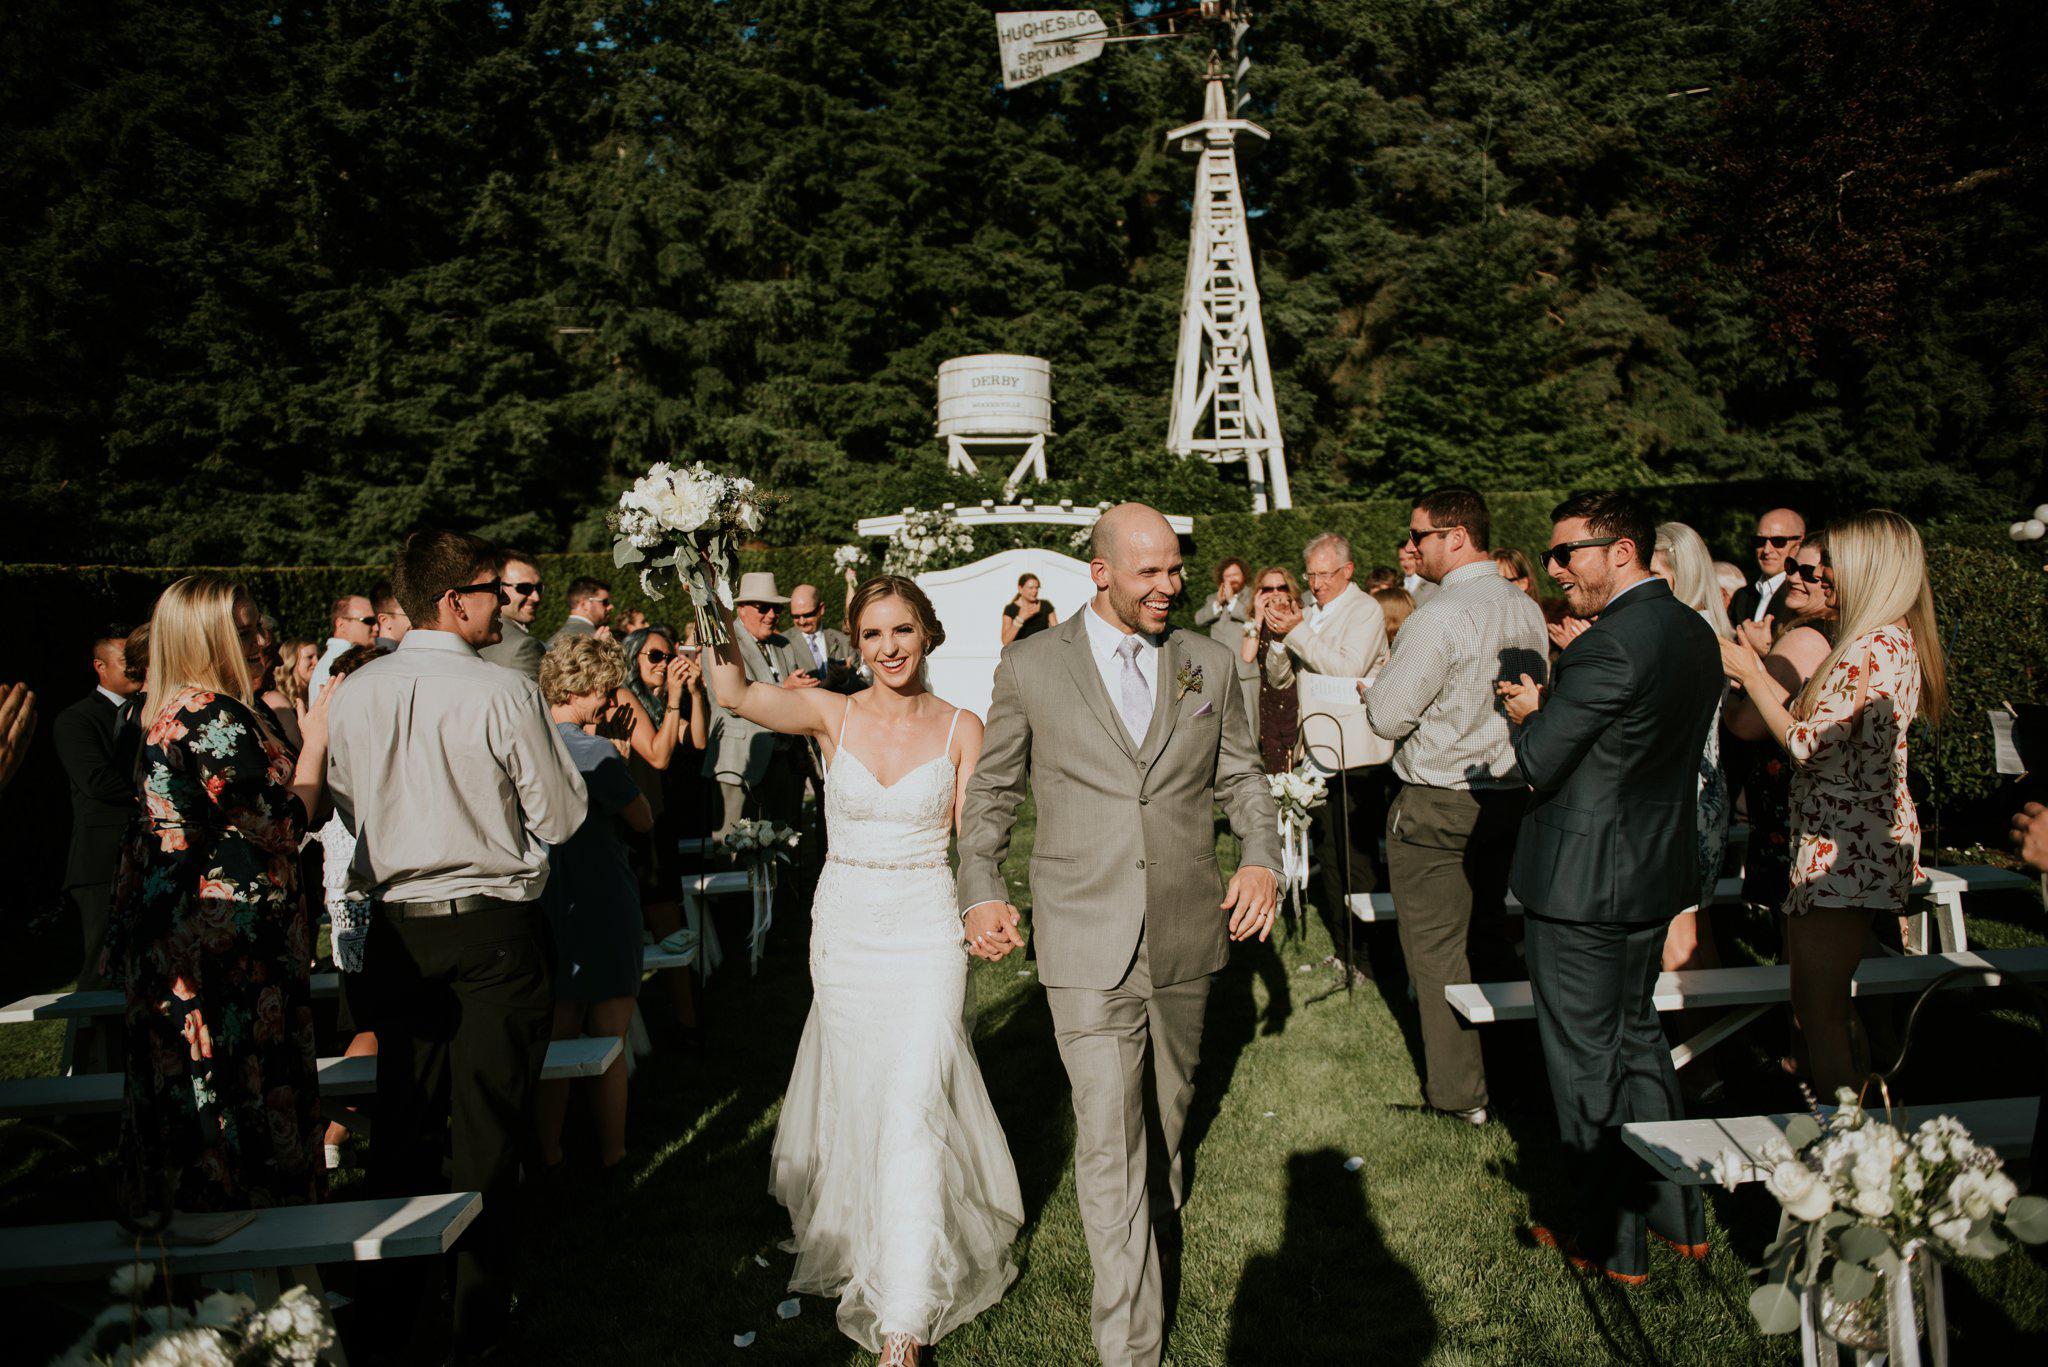 hollywood-school-house-wedding-seattle-photographer-caitlyn-nikula-82.jpg